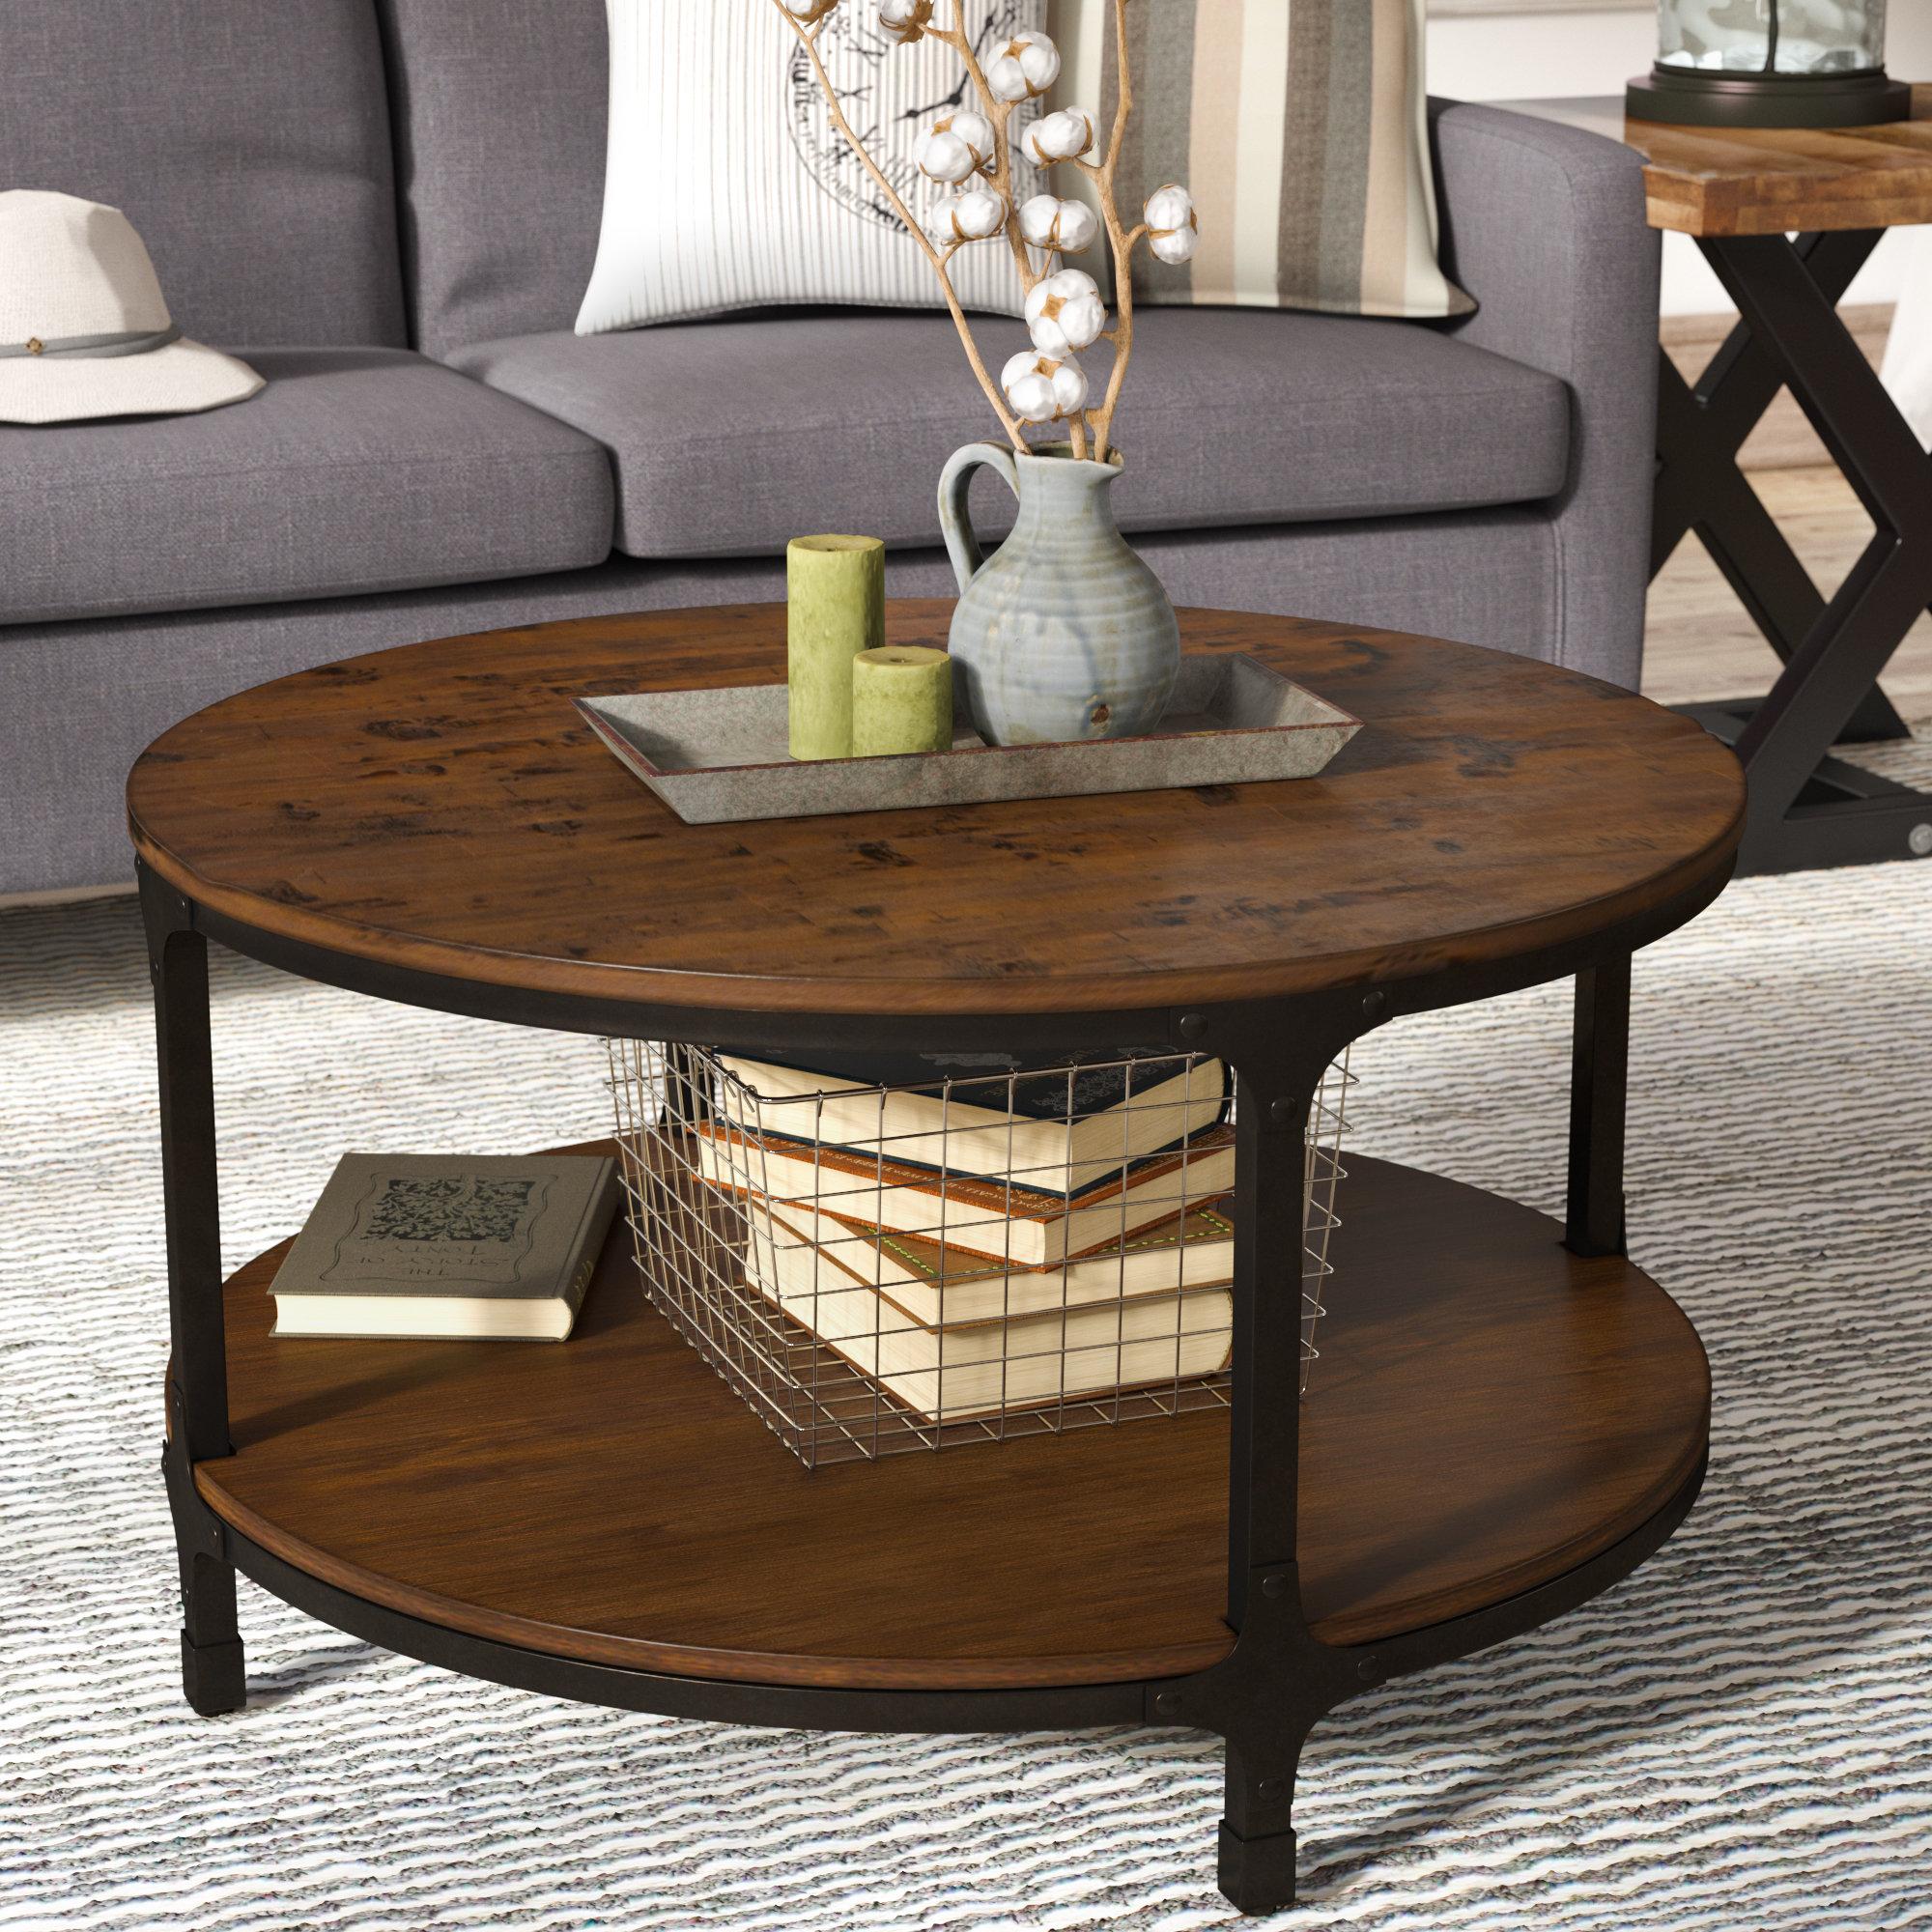 Laurel Foundry Modern Farmhouse Carolyn Round Coffee Table Reviews for dimensions 2000 X 2000